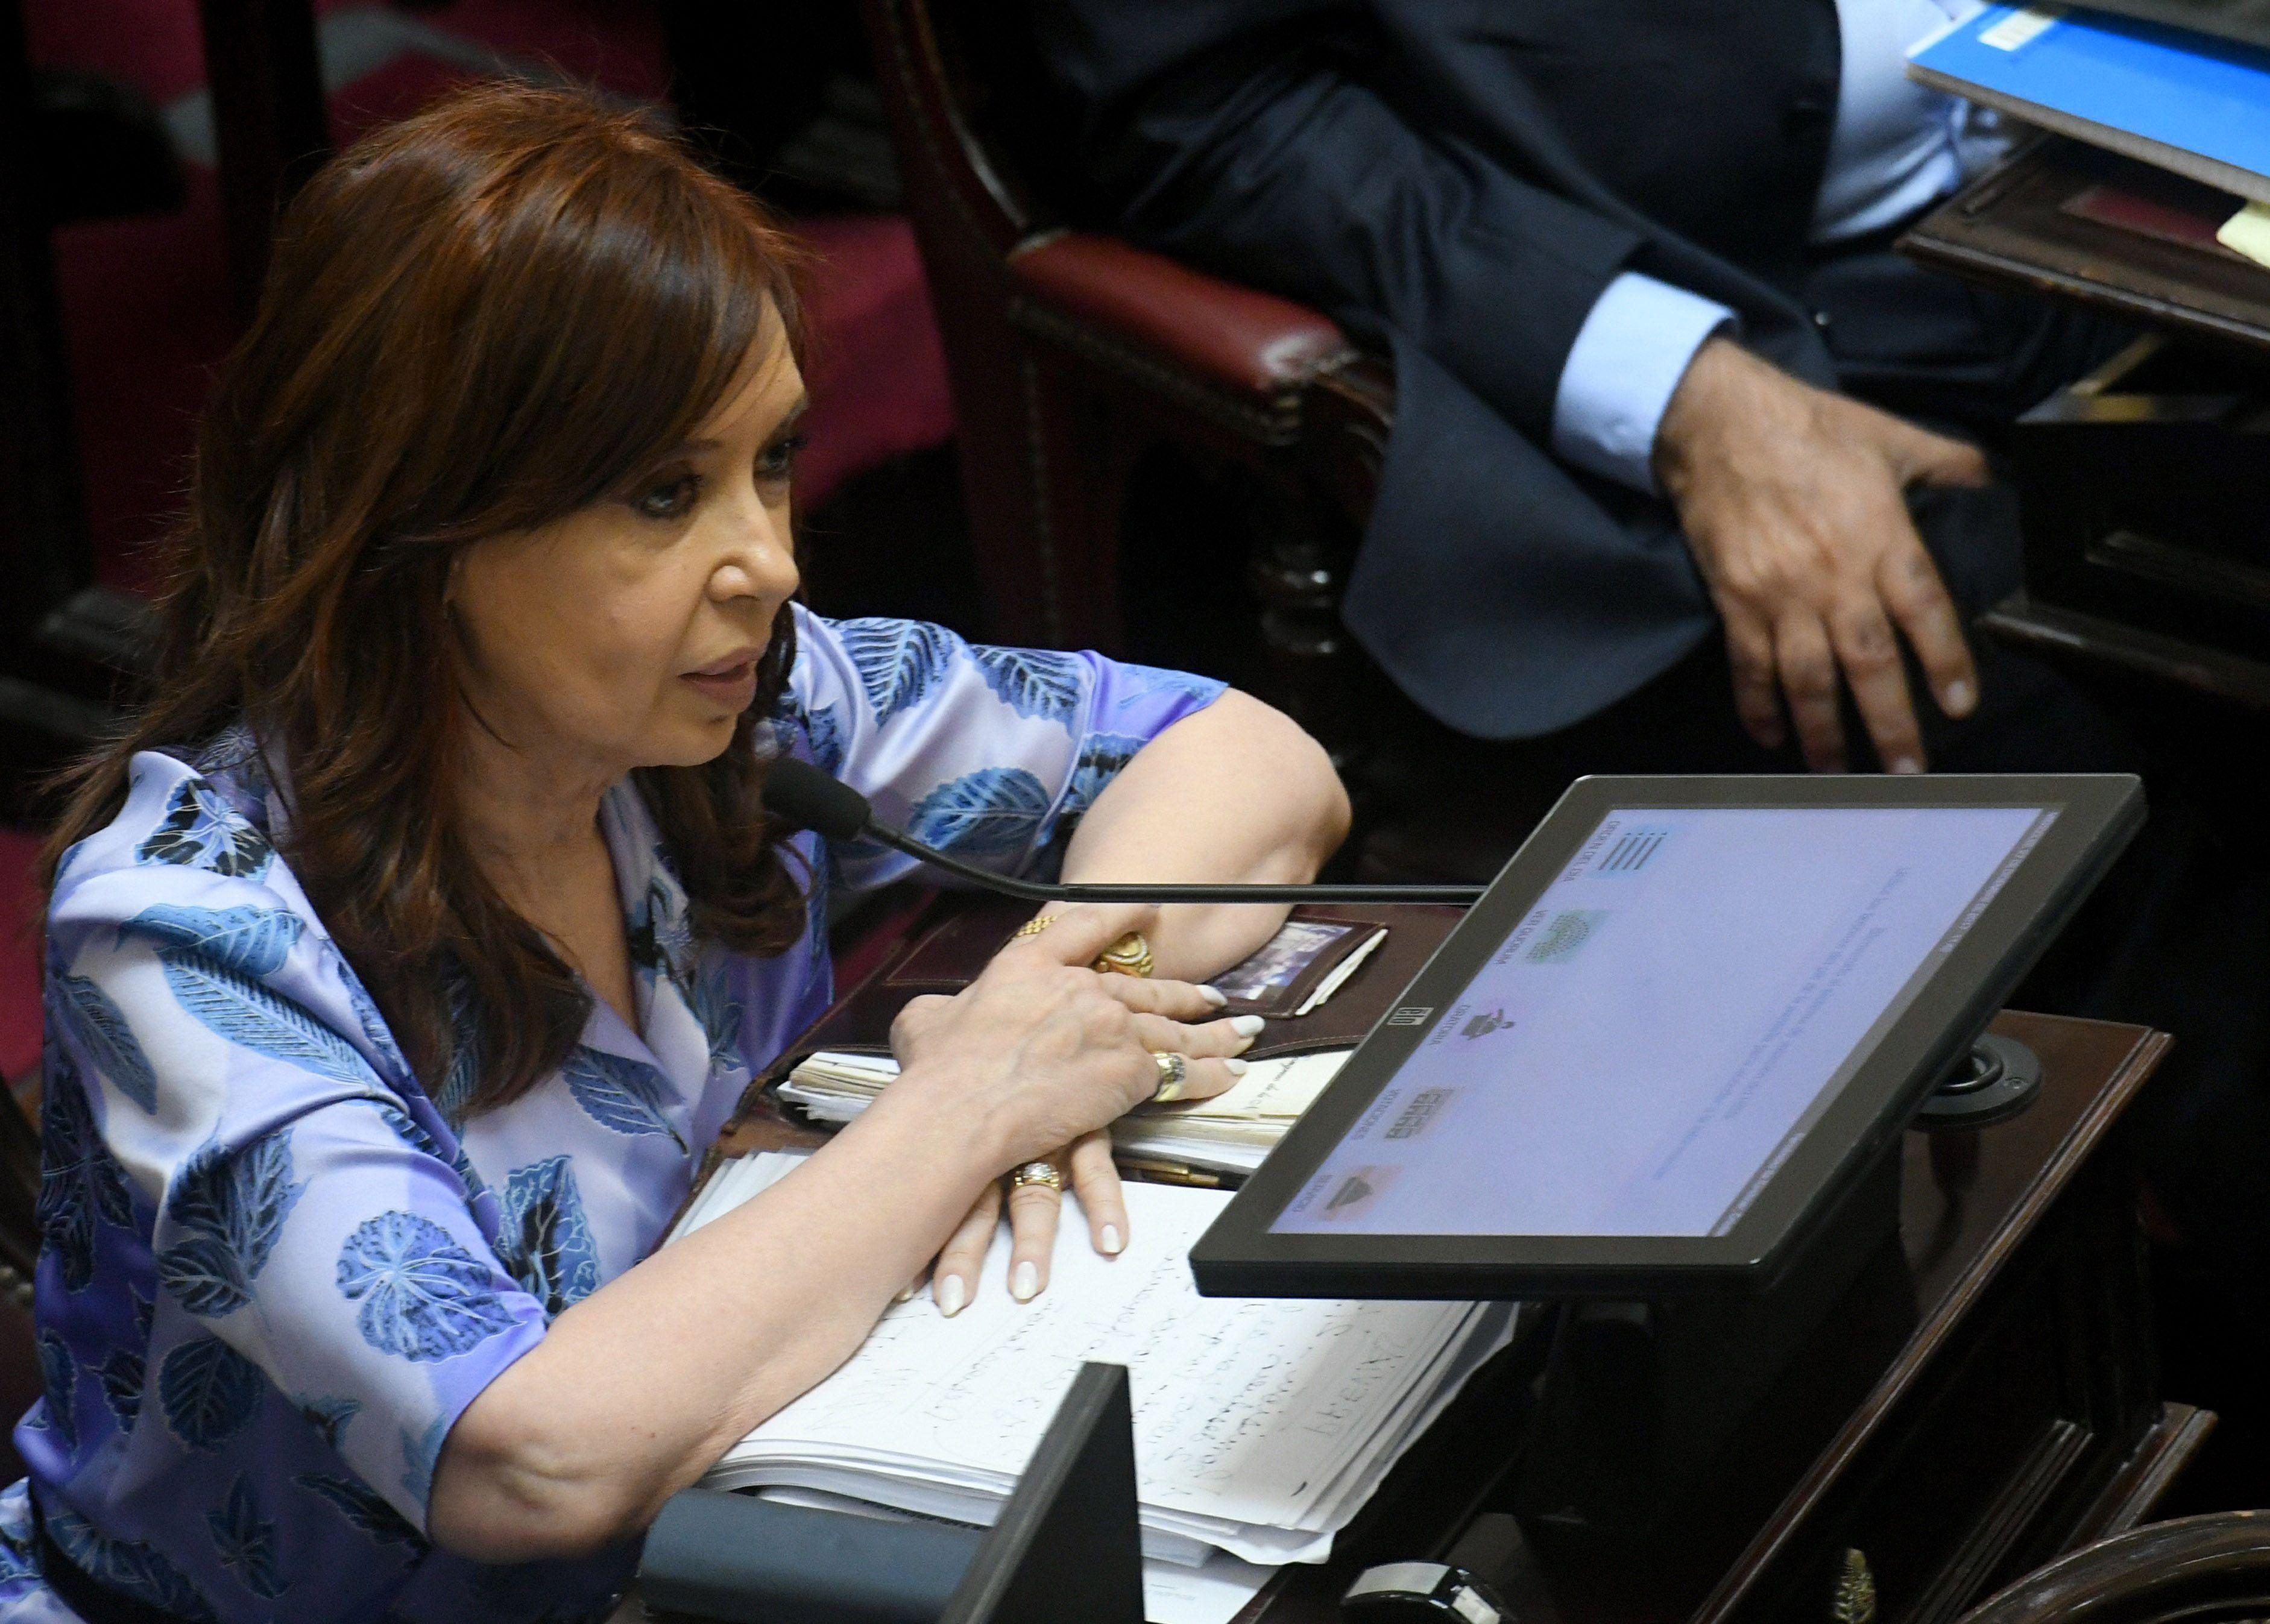 ¿Por qué Cristina Kirchner no irá a la Asamblea Legislativa que encabezará Macri?